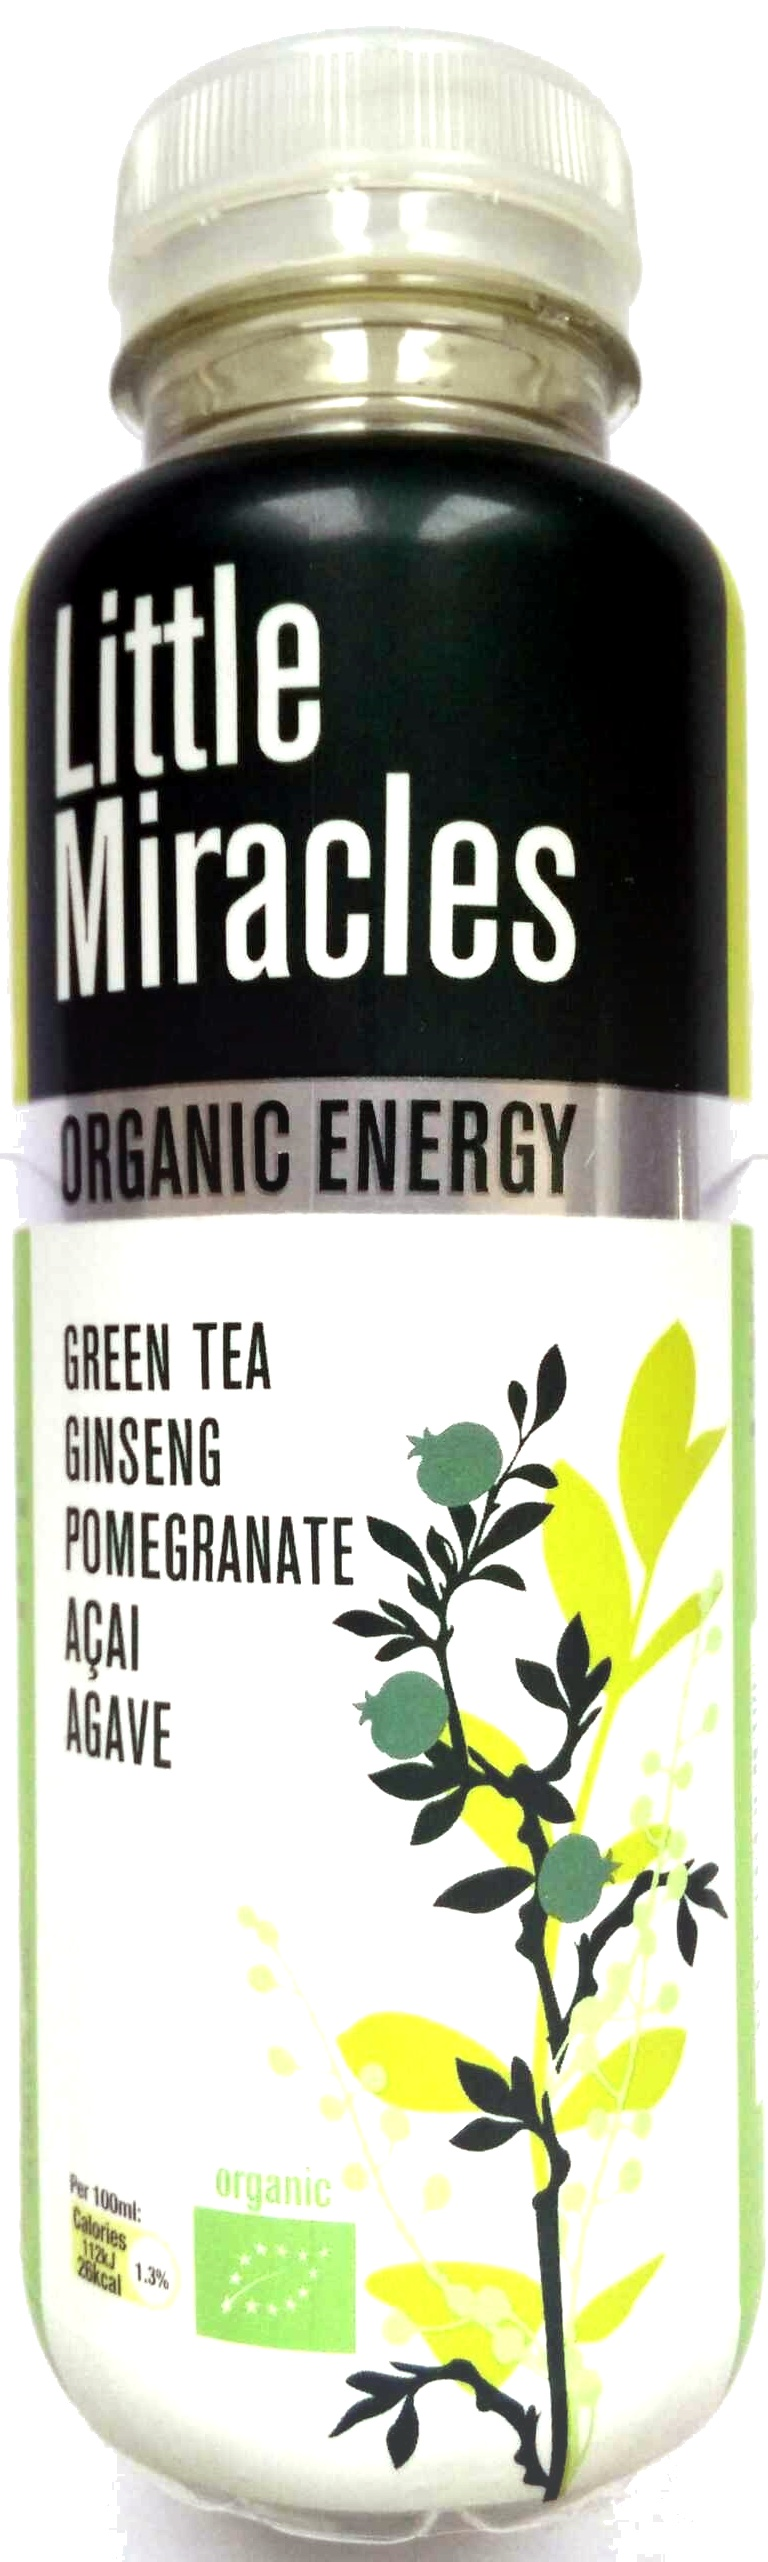 Green Tea Pomegranate Acai Ginseng Agave - Product